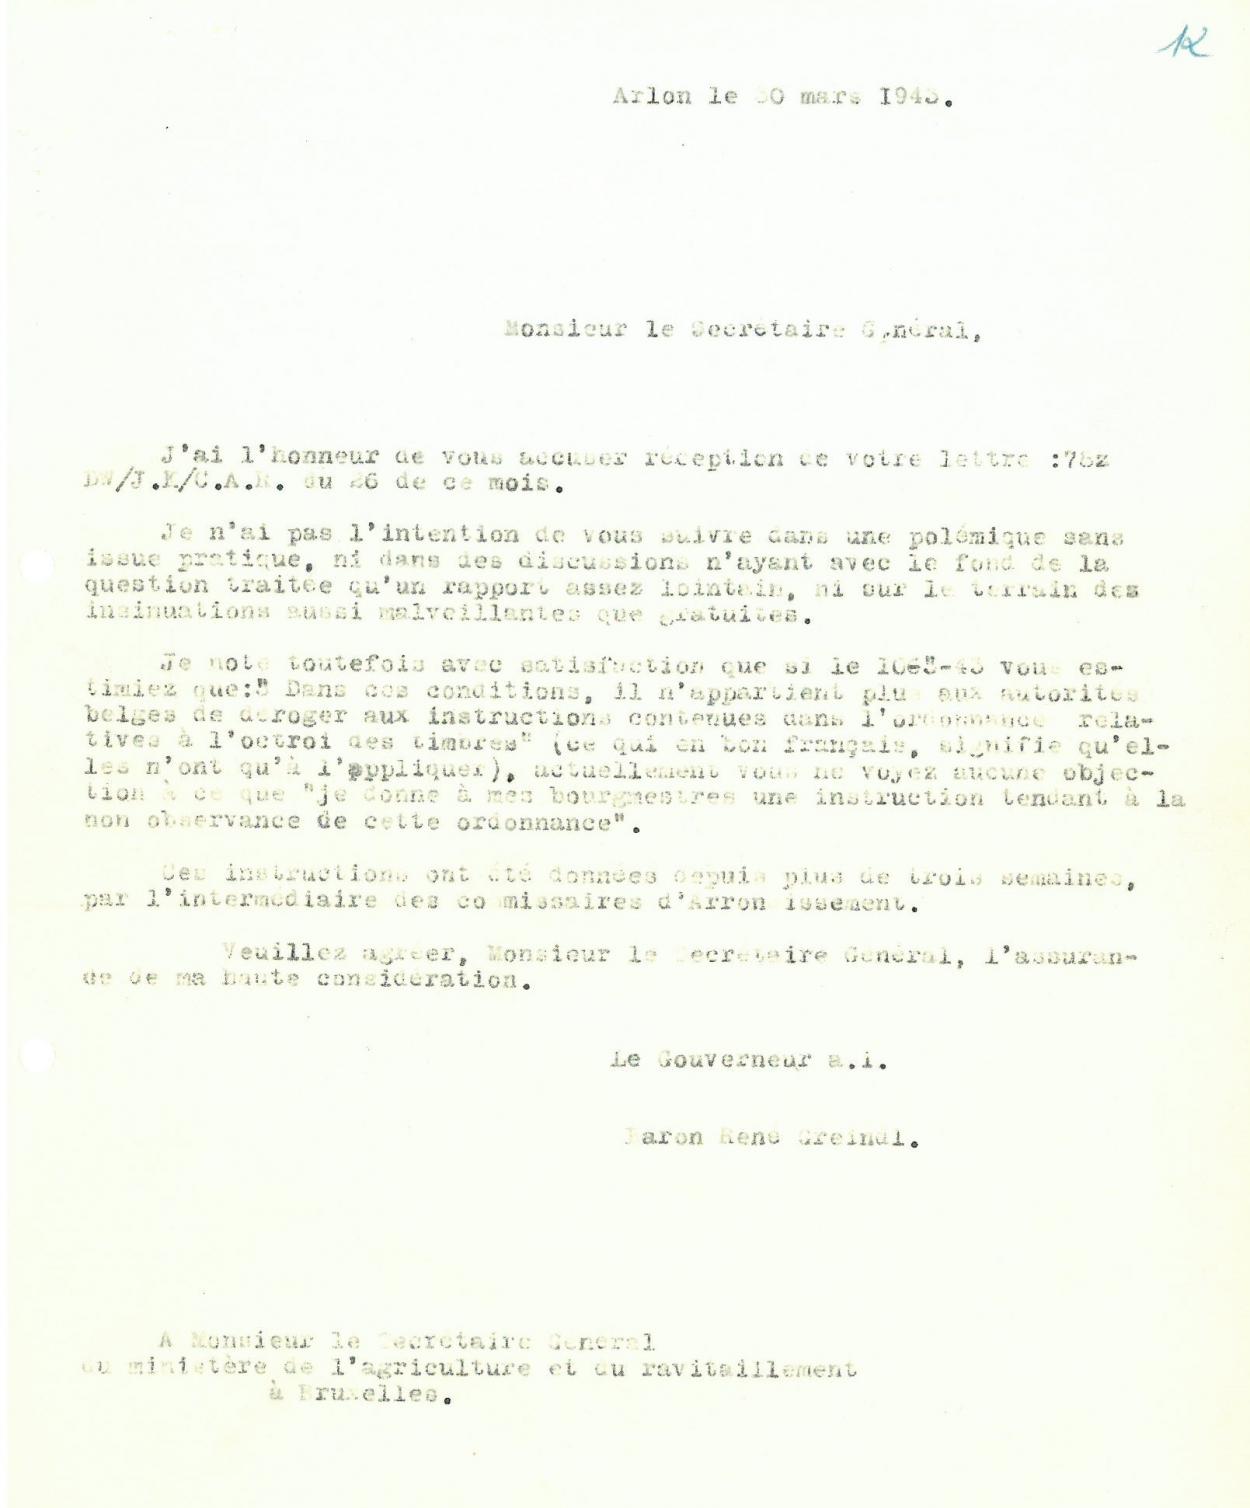 lettre-greindl-de-winter-30-3-1943.jpg